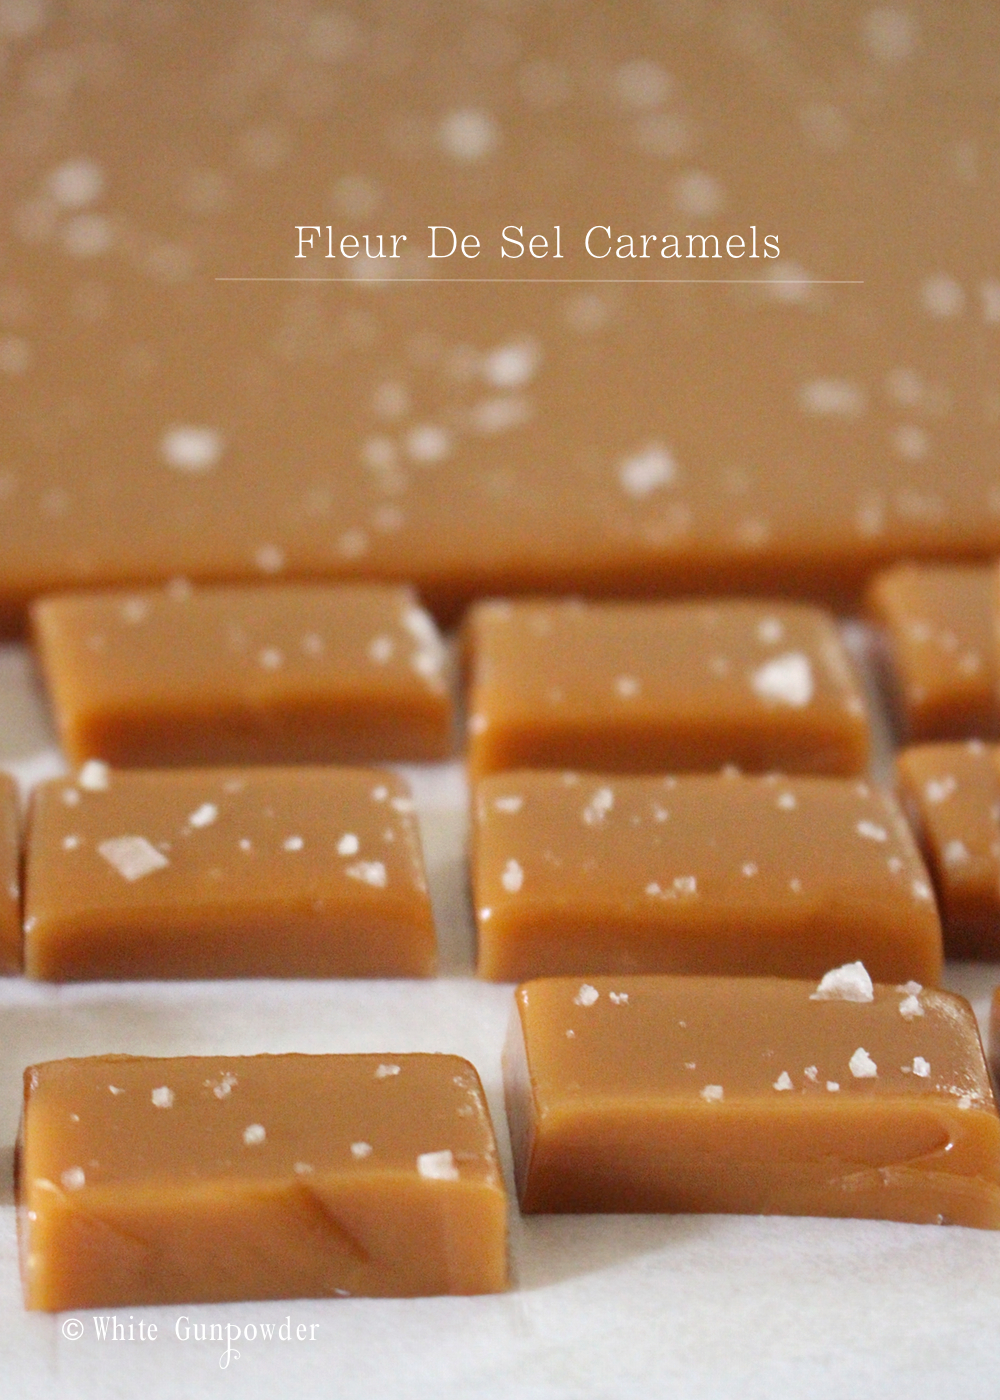 Fleur De Sel Caramels - White Gunpowder